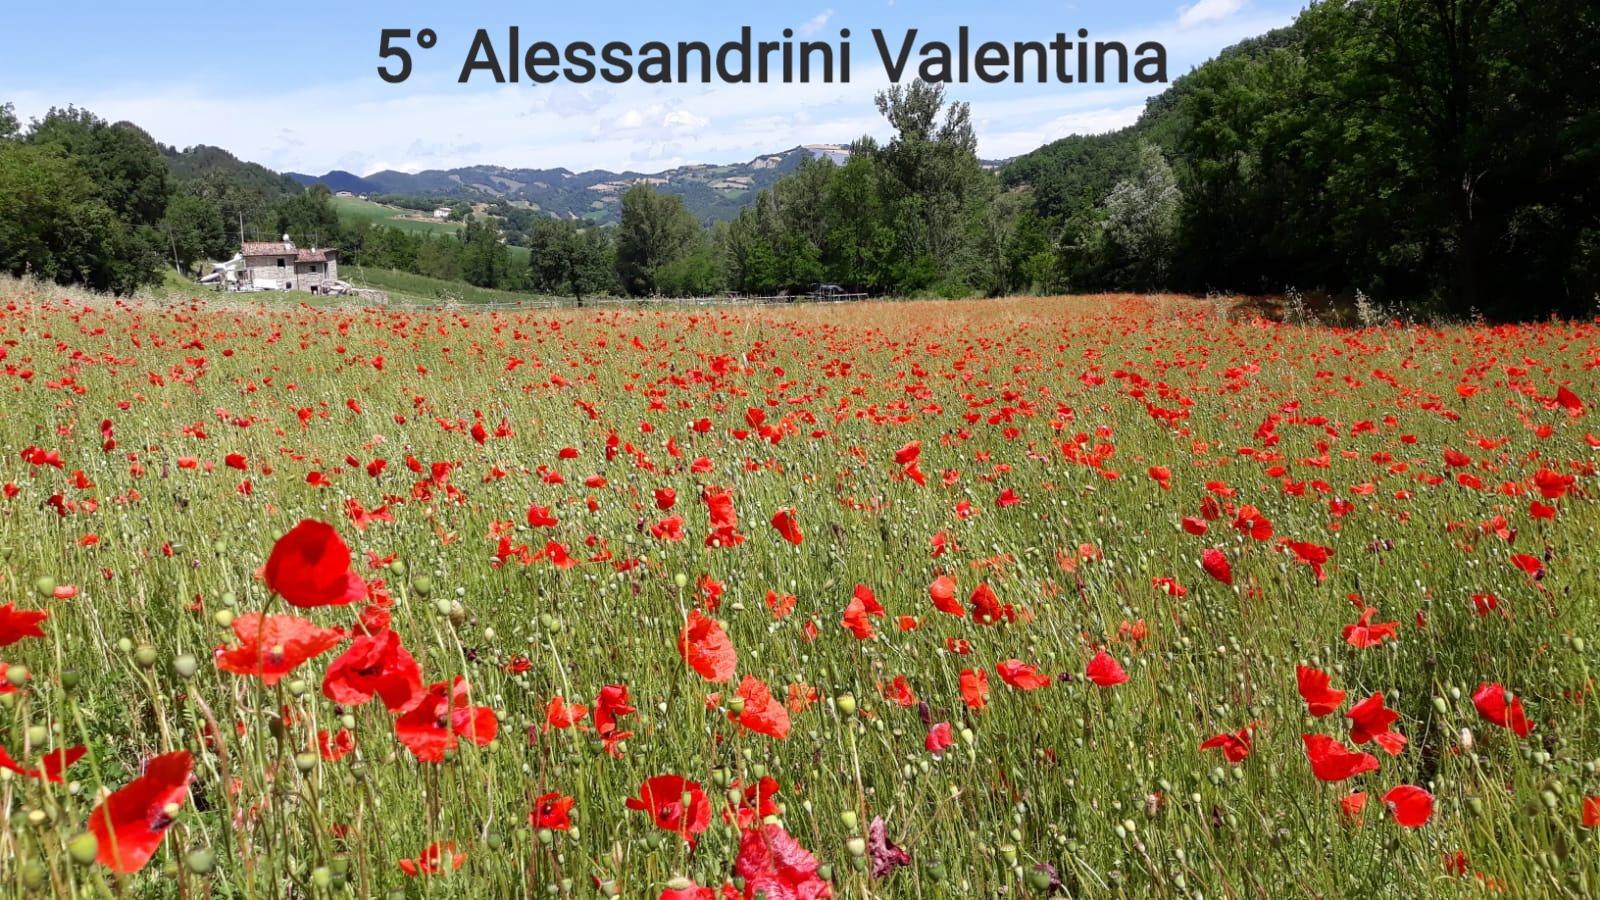 5° Alessandrini Valentina